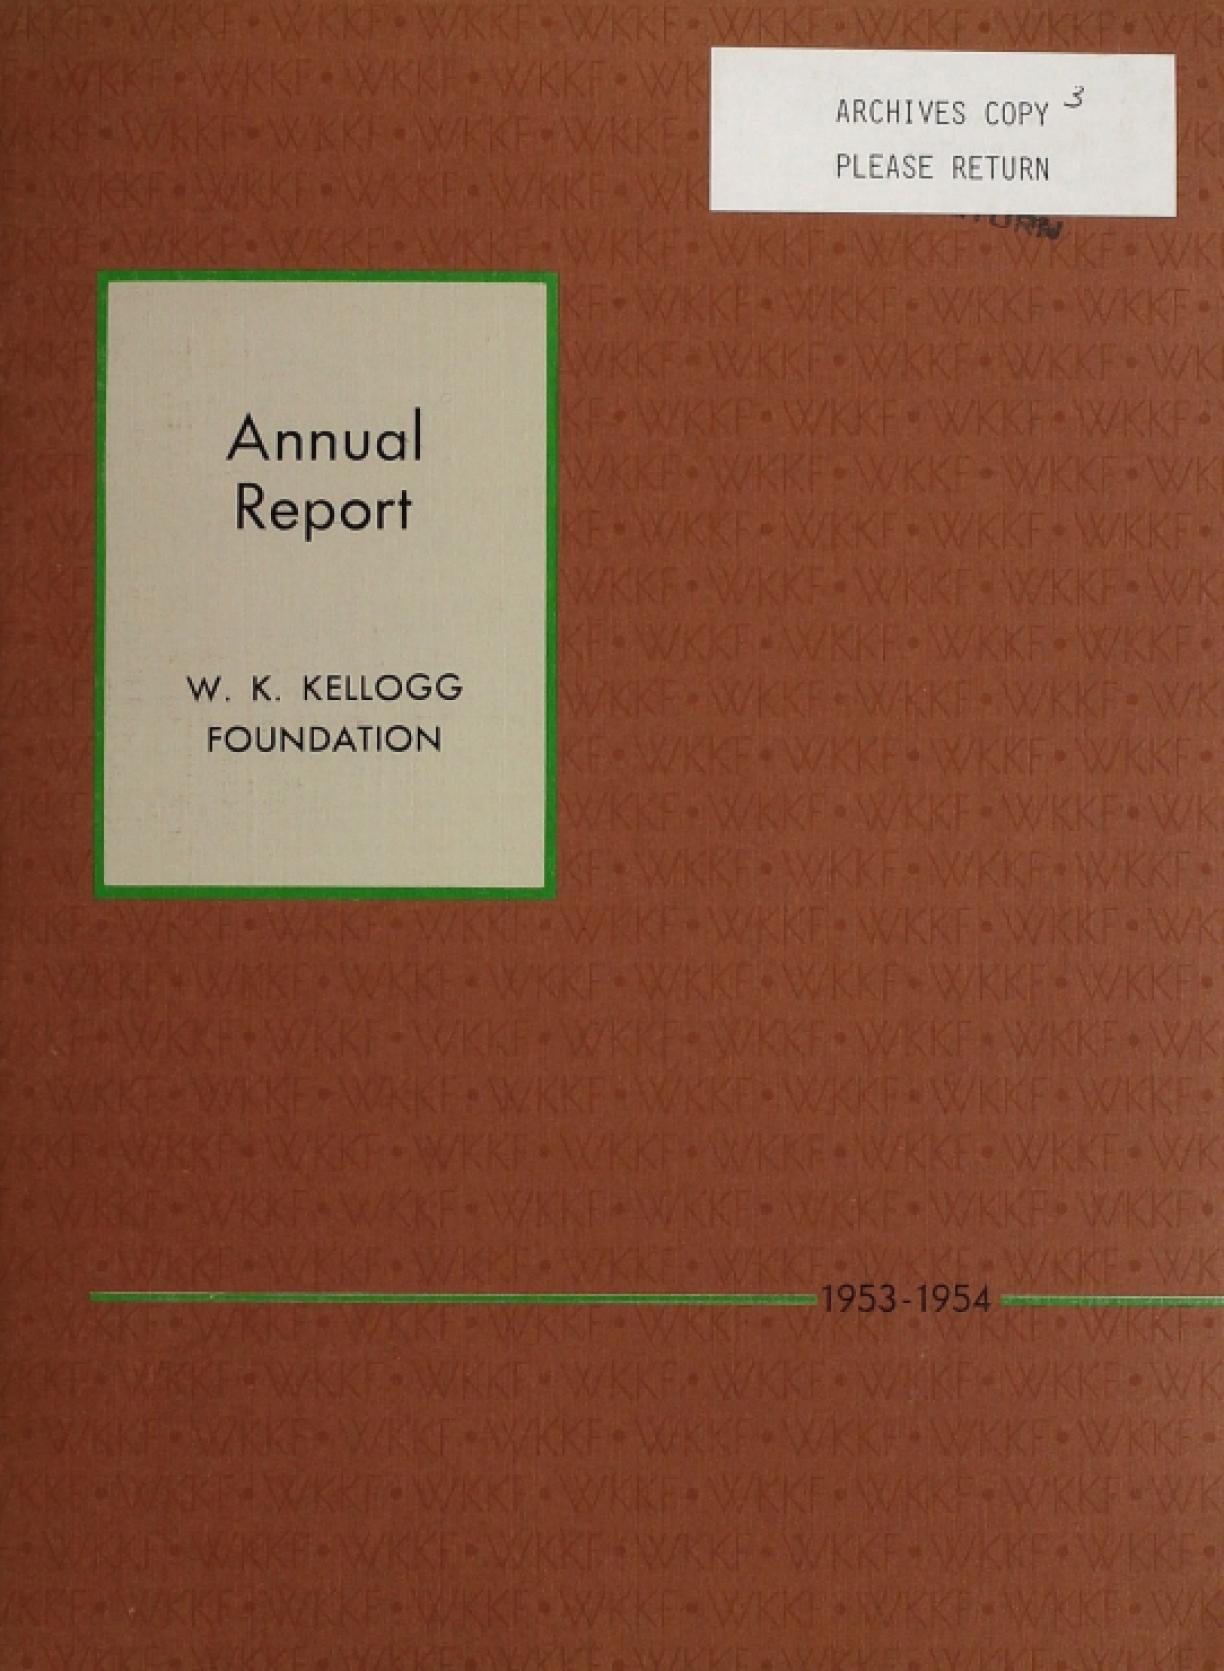 1953-1954 W.K. Kellogg Foundation Annual Report